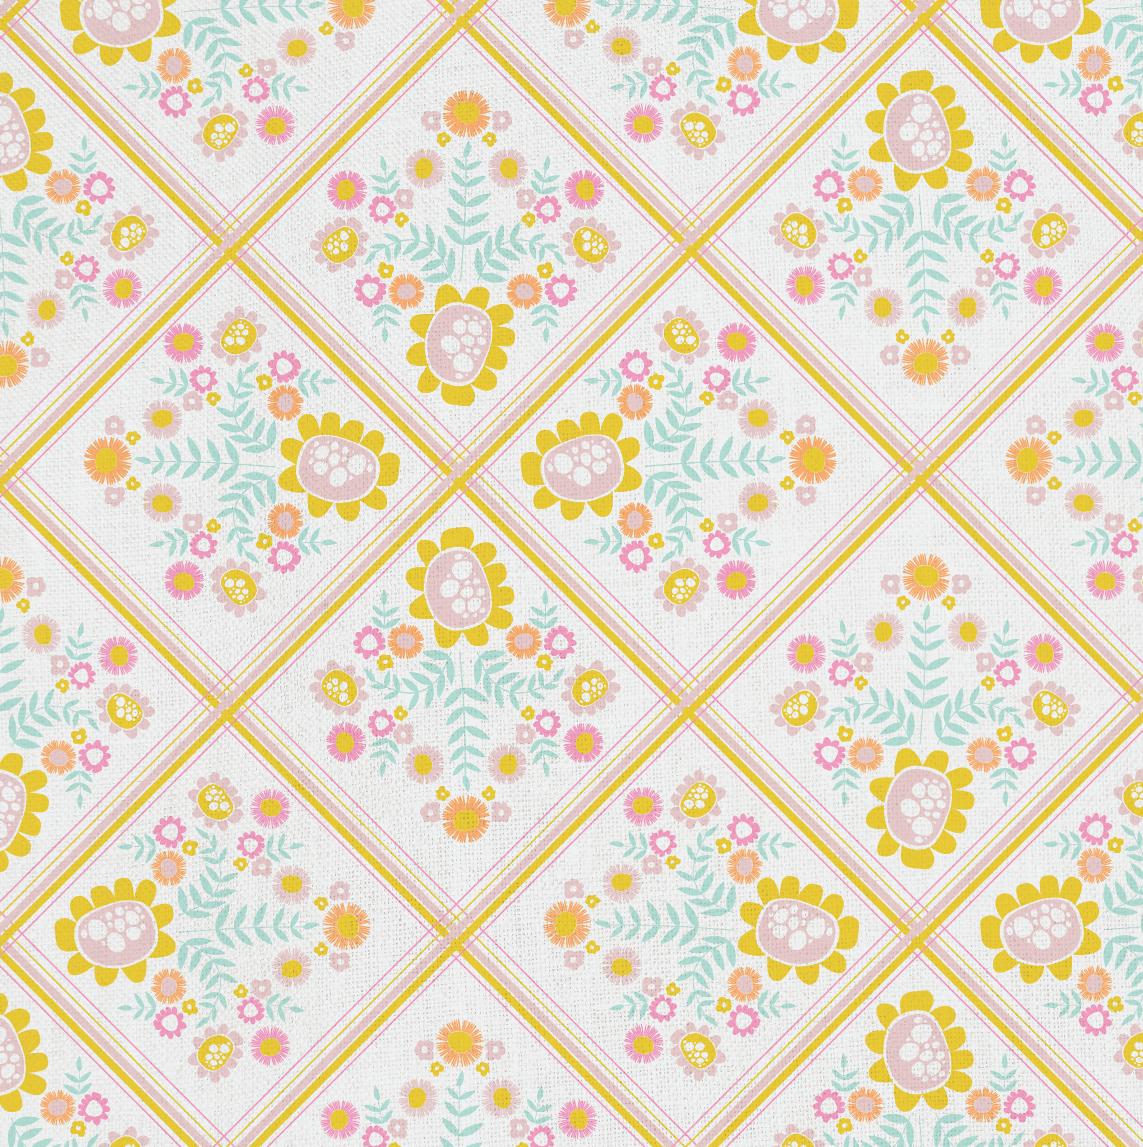 floral-fern-daisy-bohemian-hippie-pattern-surface-vintage-pattern-arglye-plaid-nonna-illustration-design.png